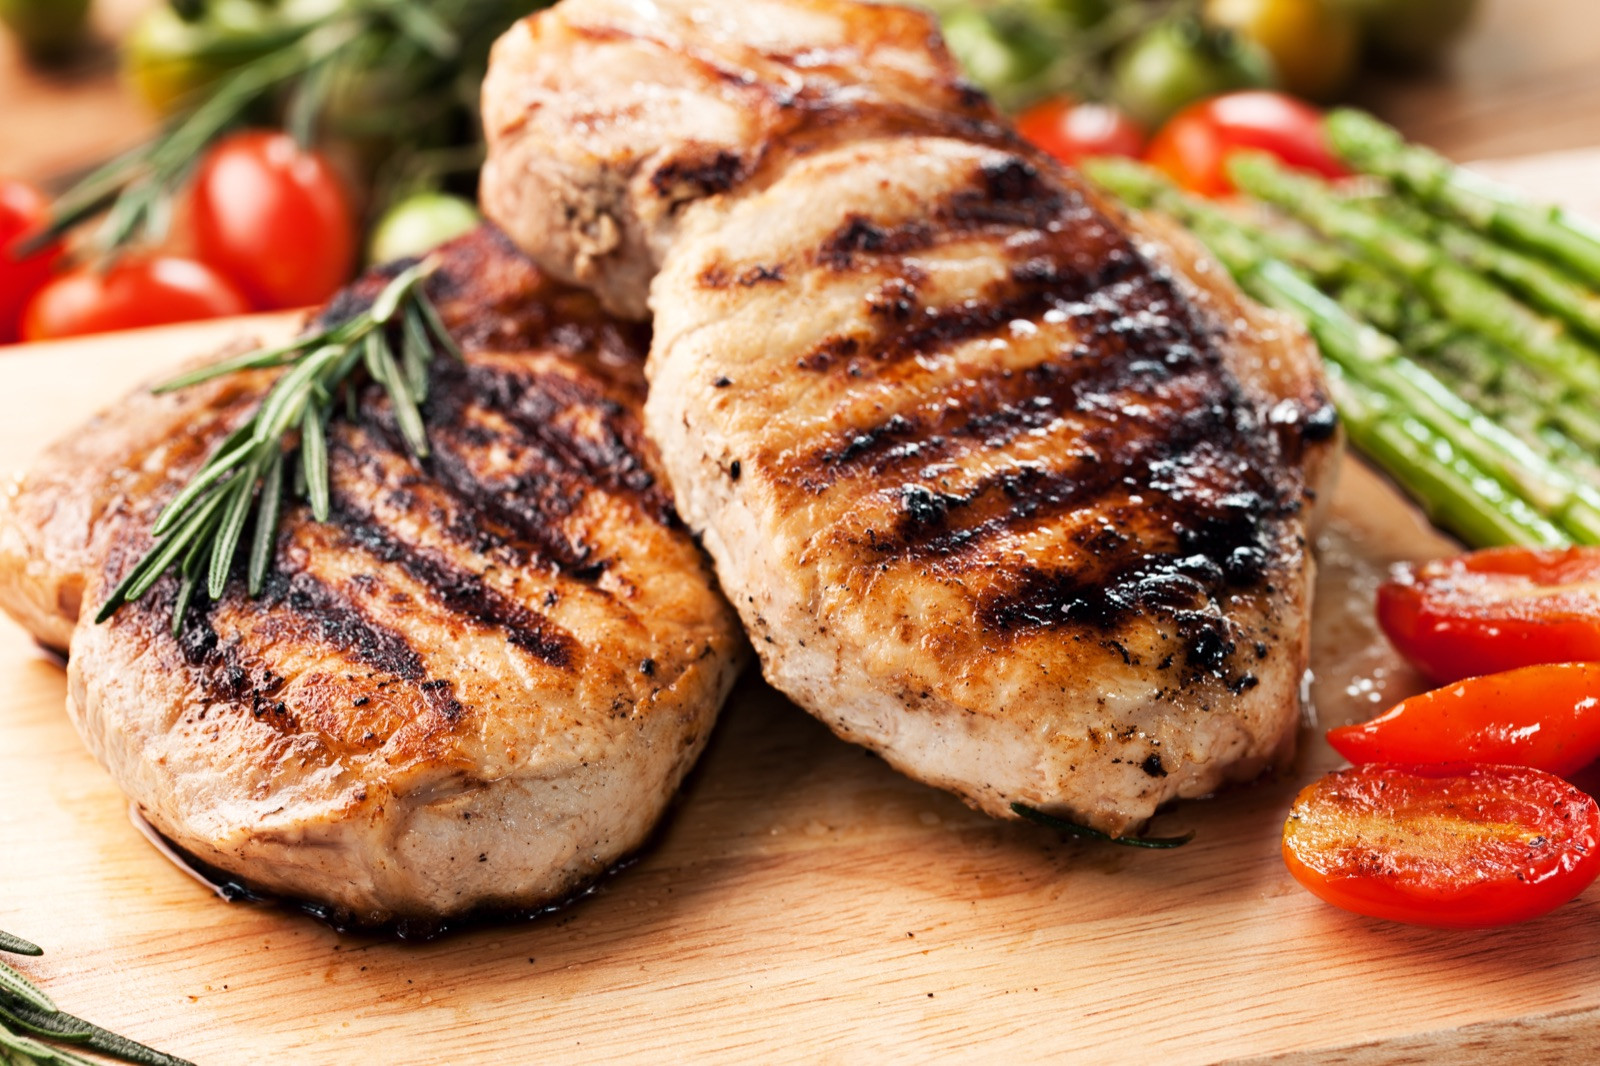 Grilling Boneless Pork Chops  Naturally Raised Boneless Pork Chops Farmway Foods